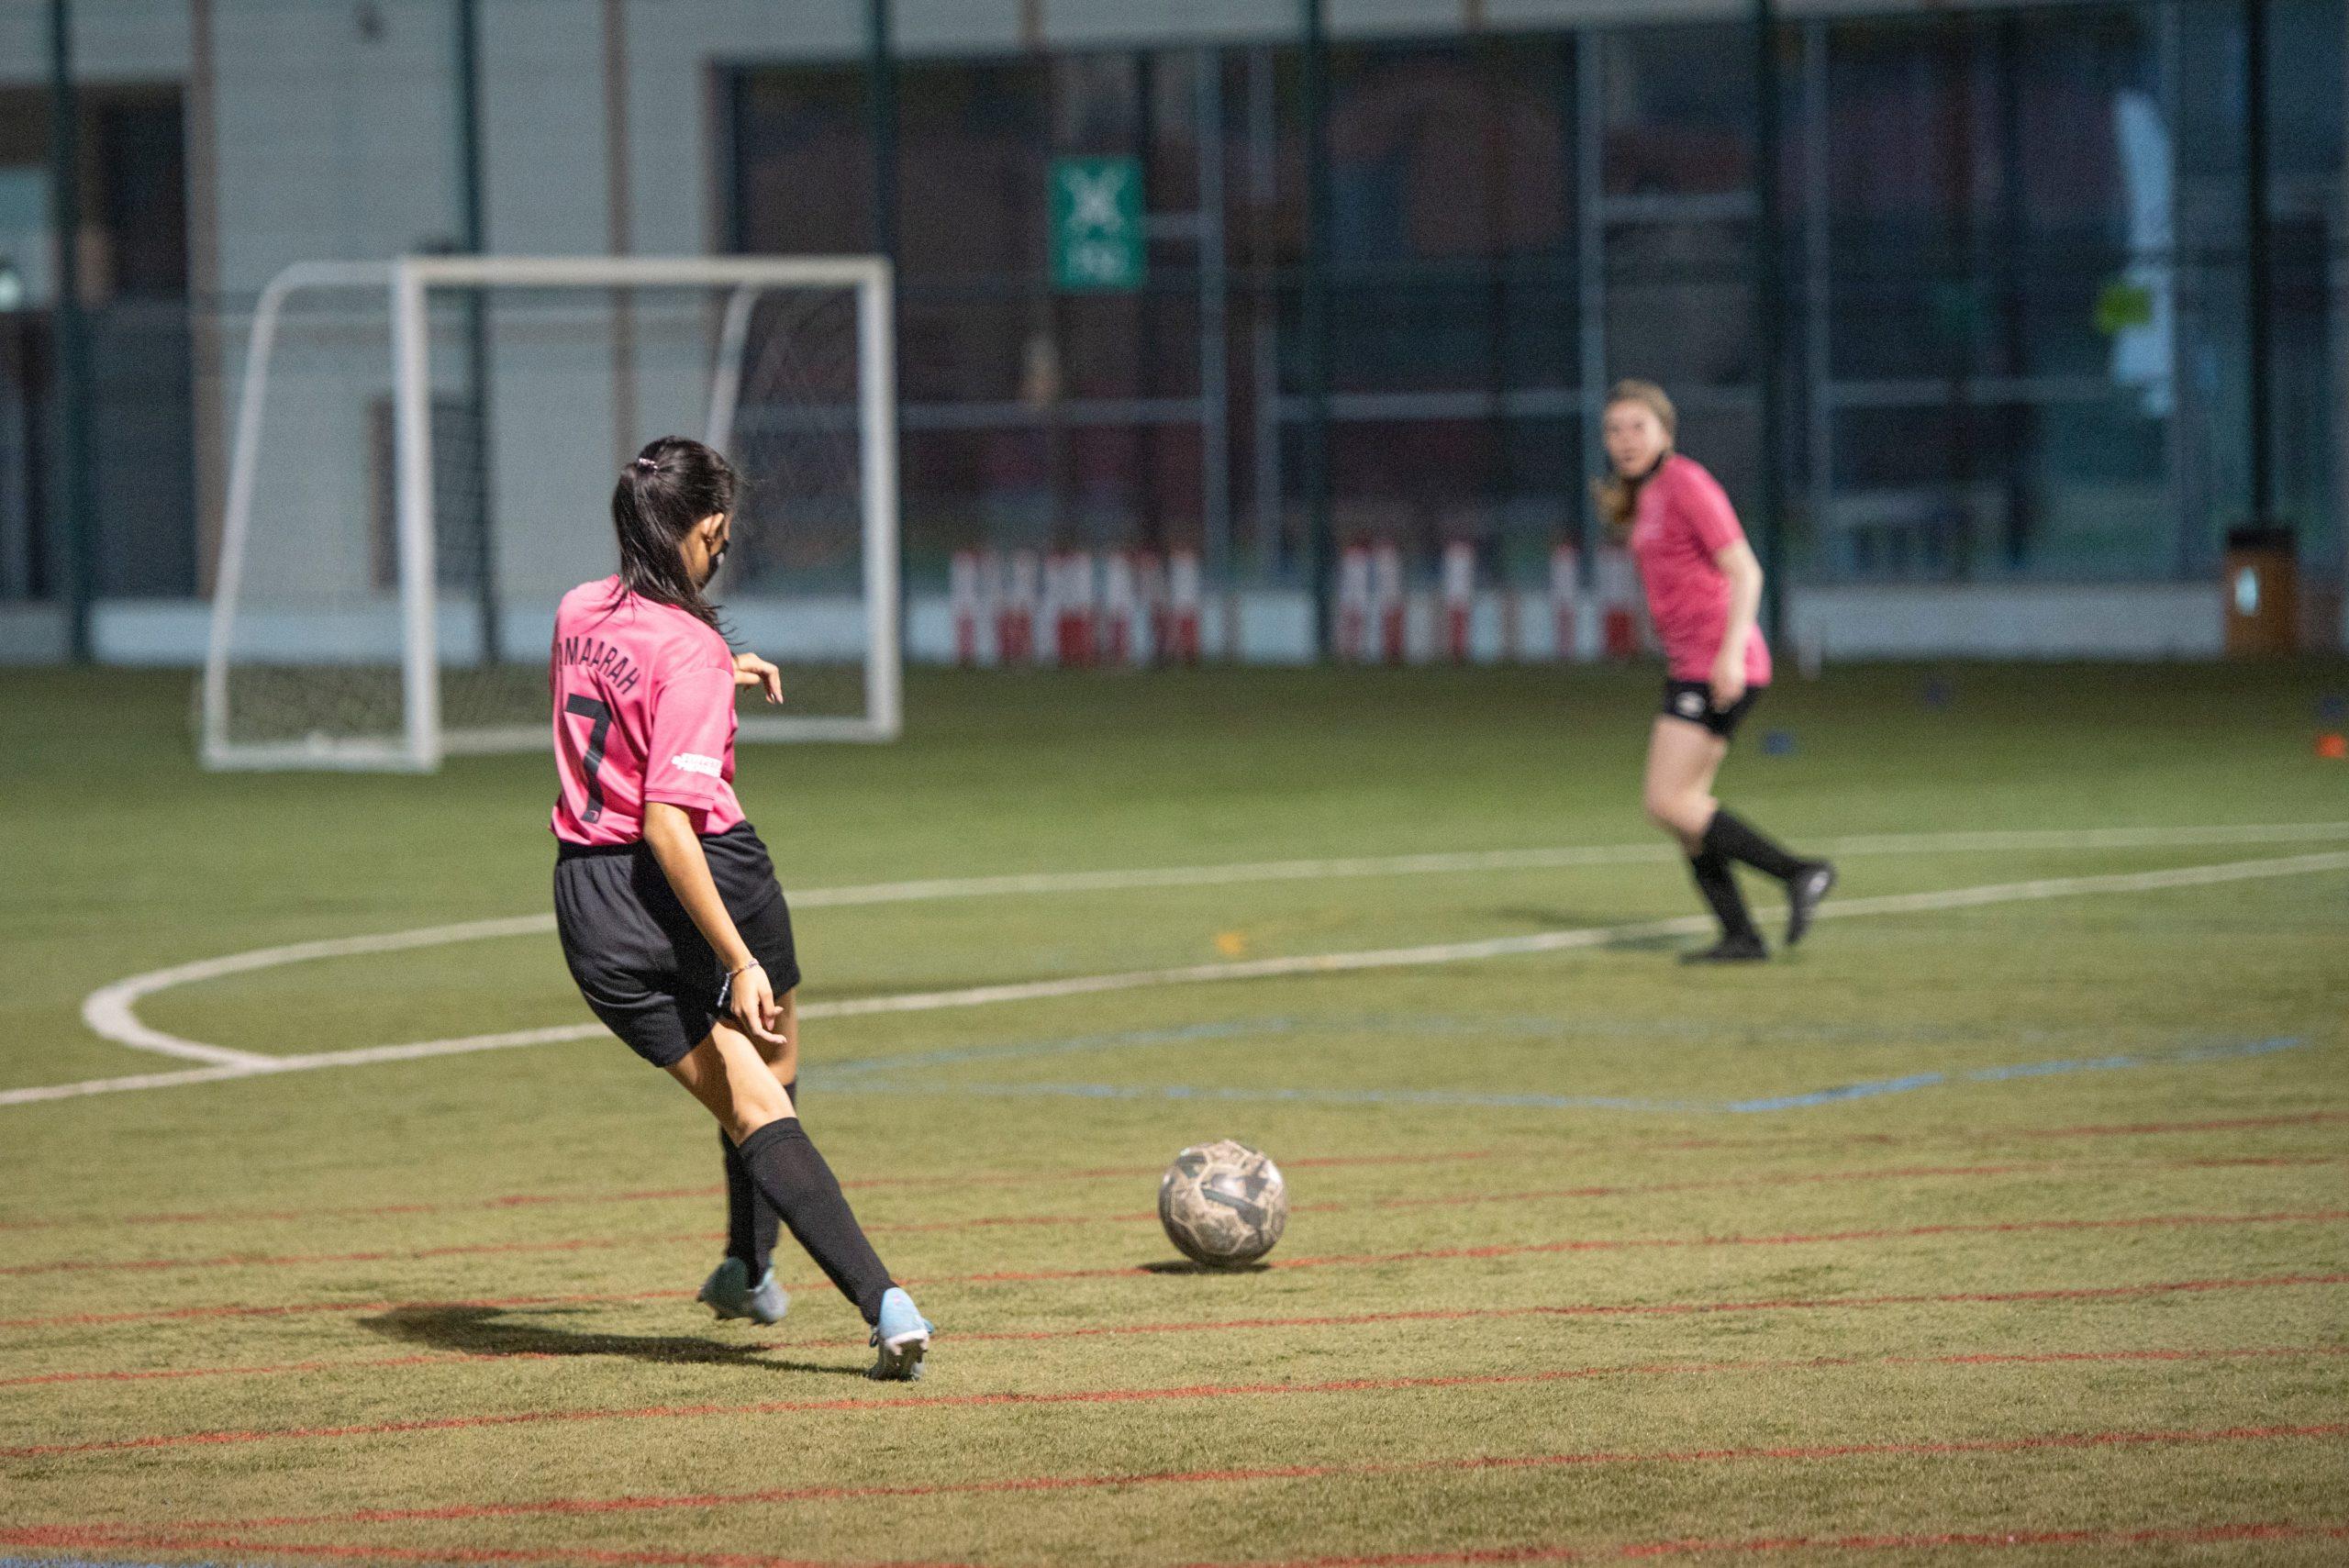 My experience doing Girls Football